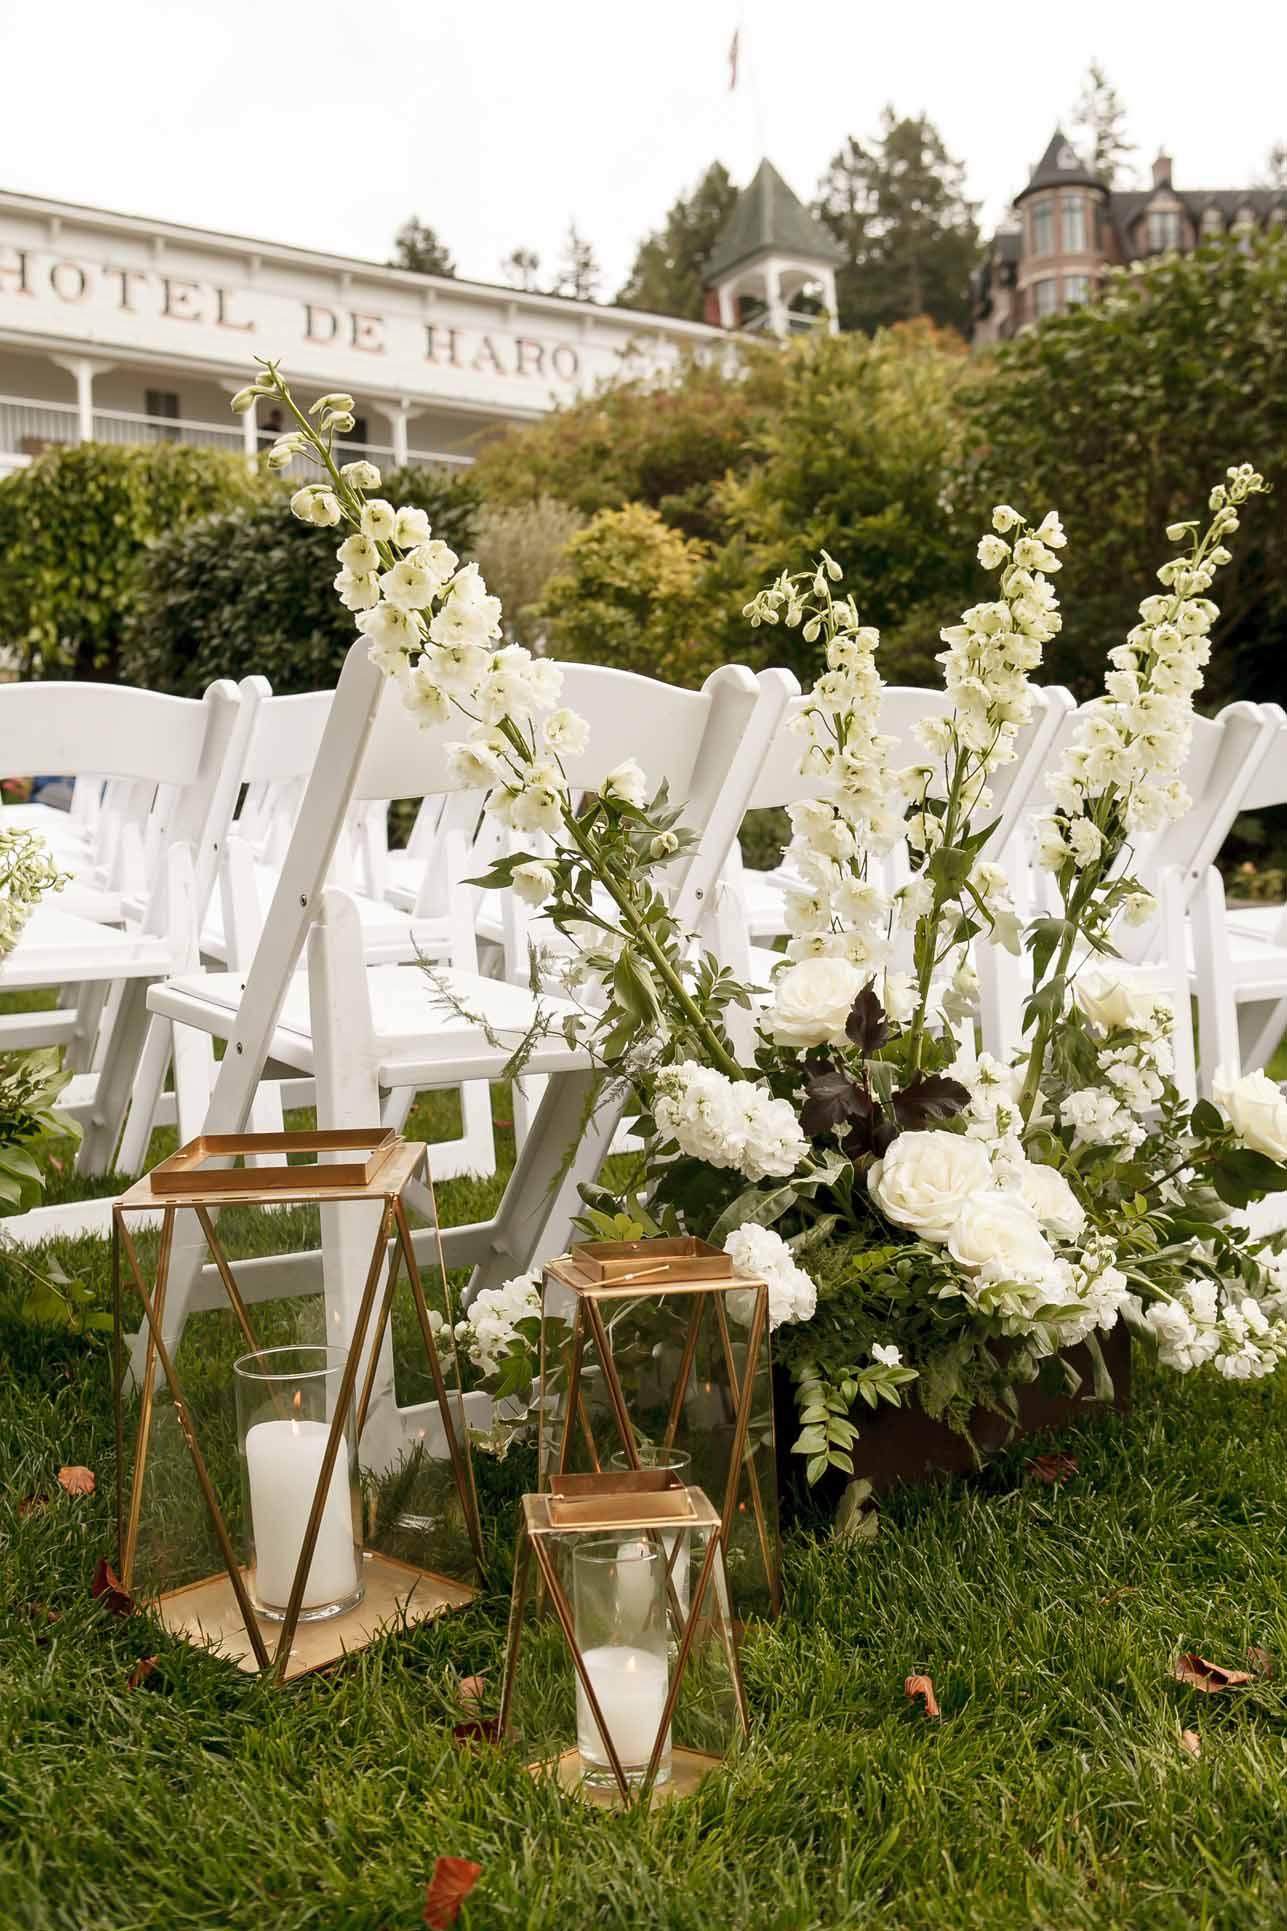 Wedding ceremony decor with lanterns and white flowers